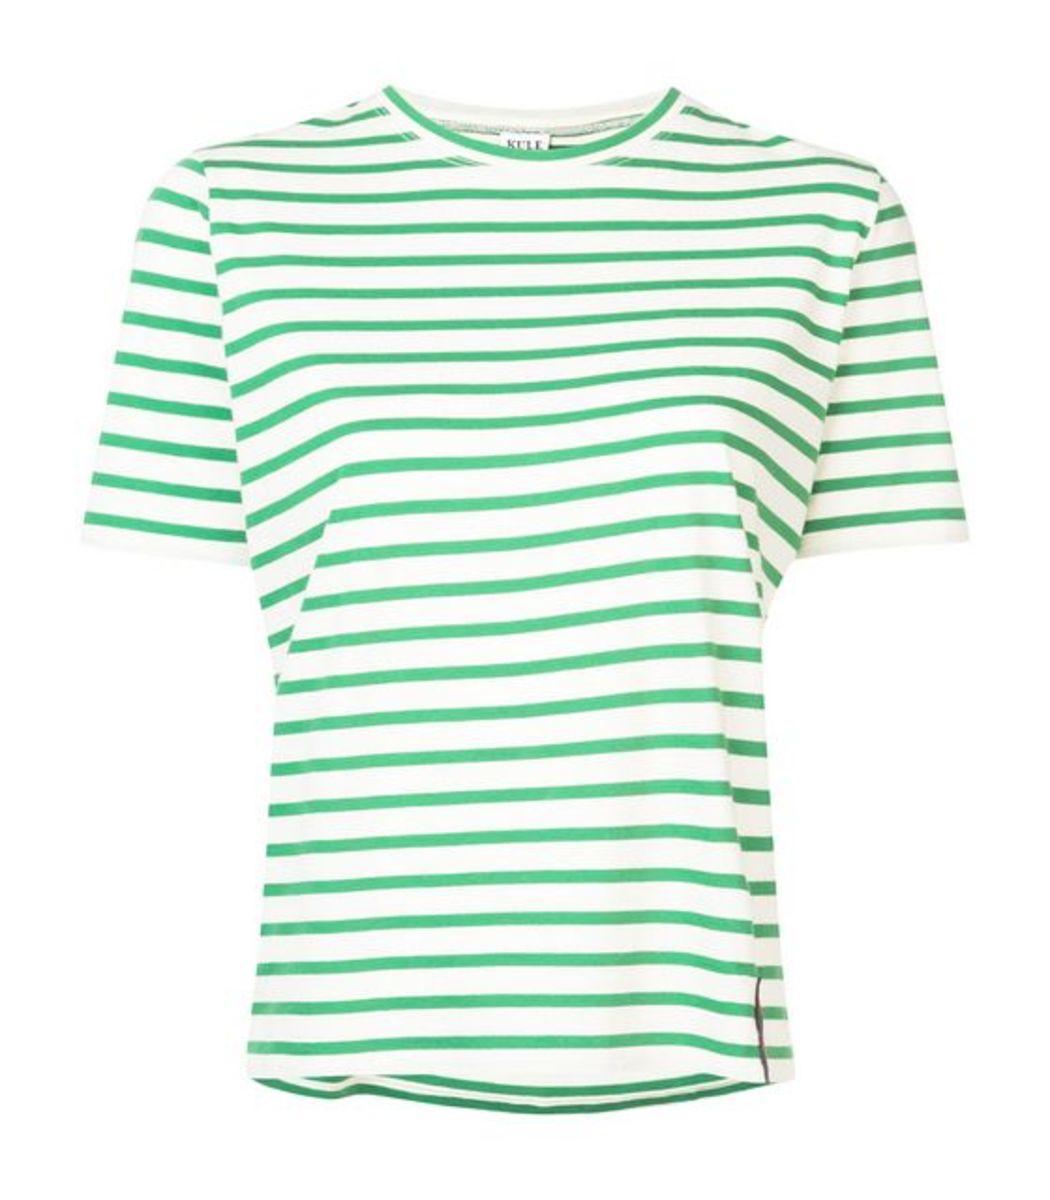 KULE Green/White Striped TShirt